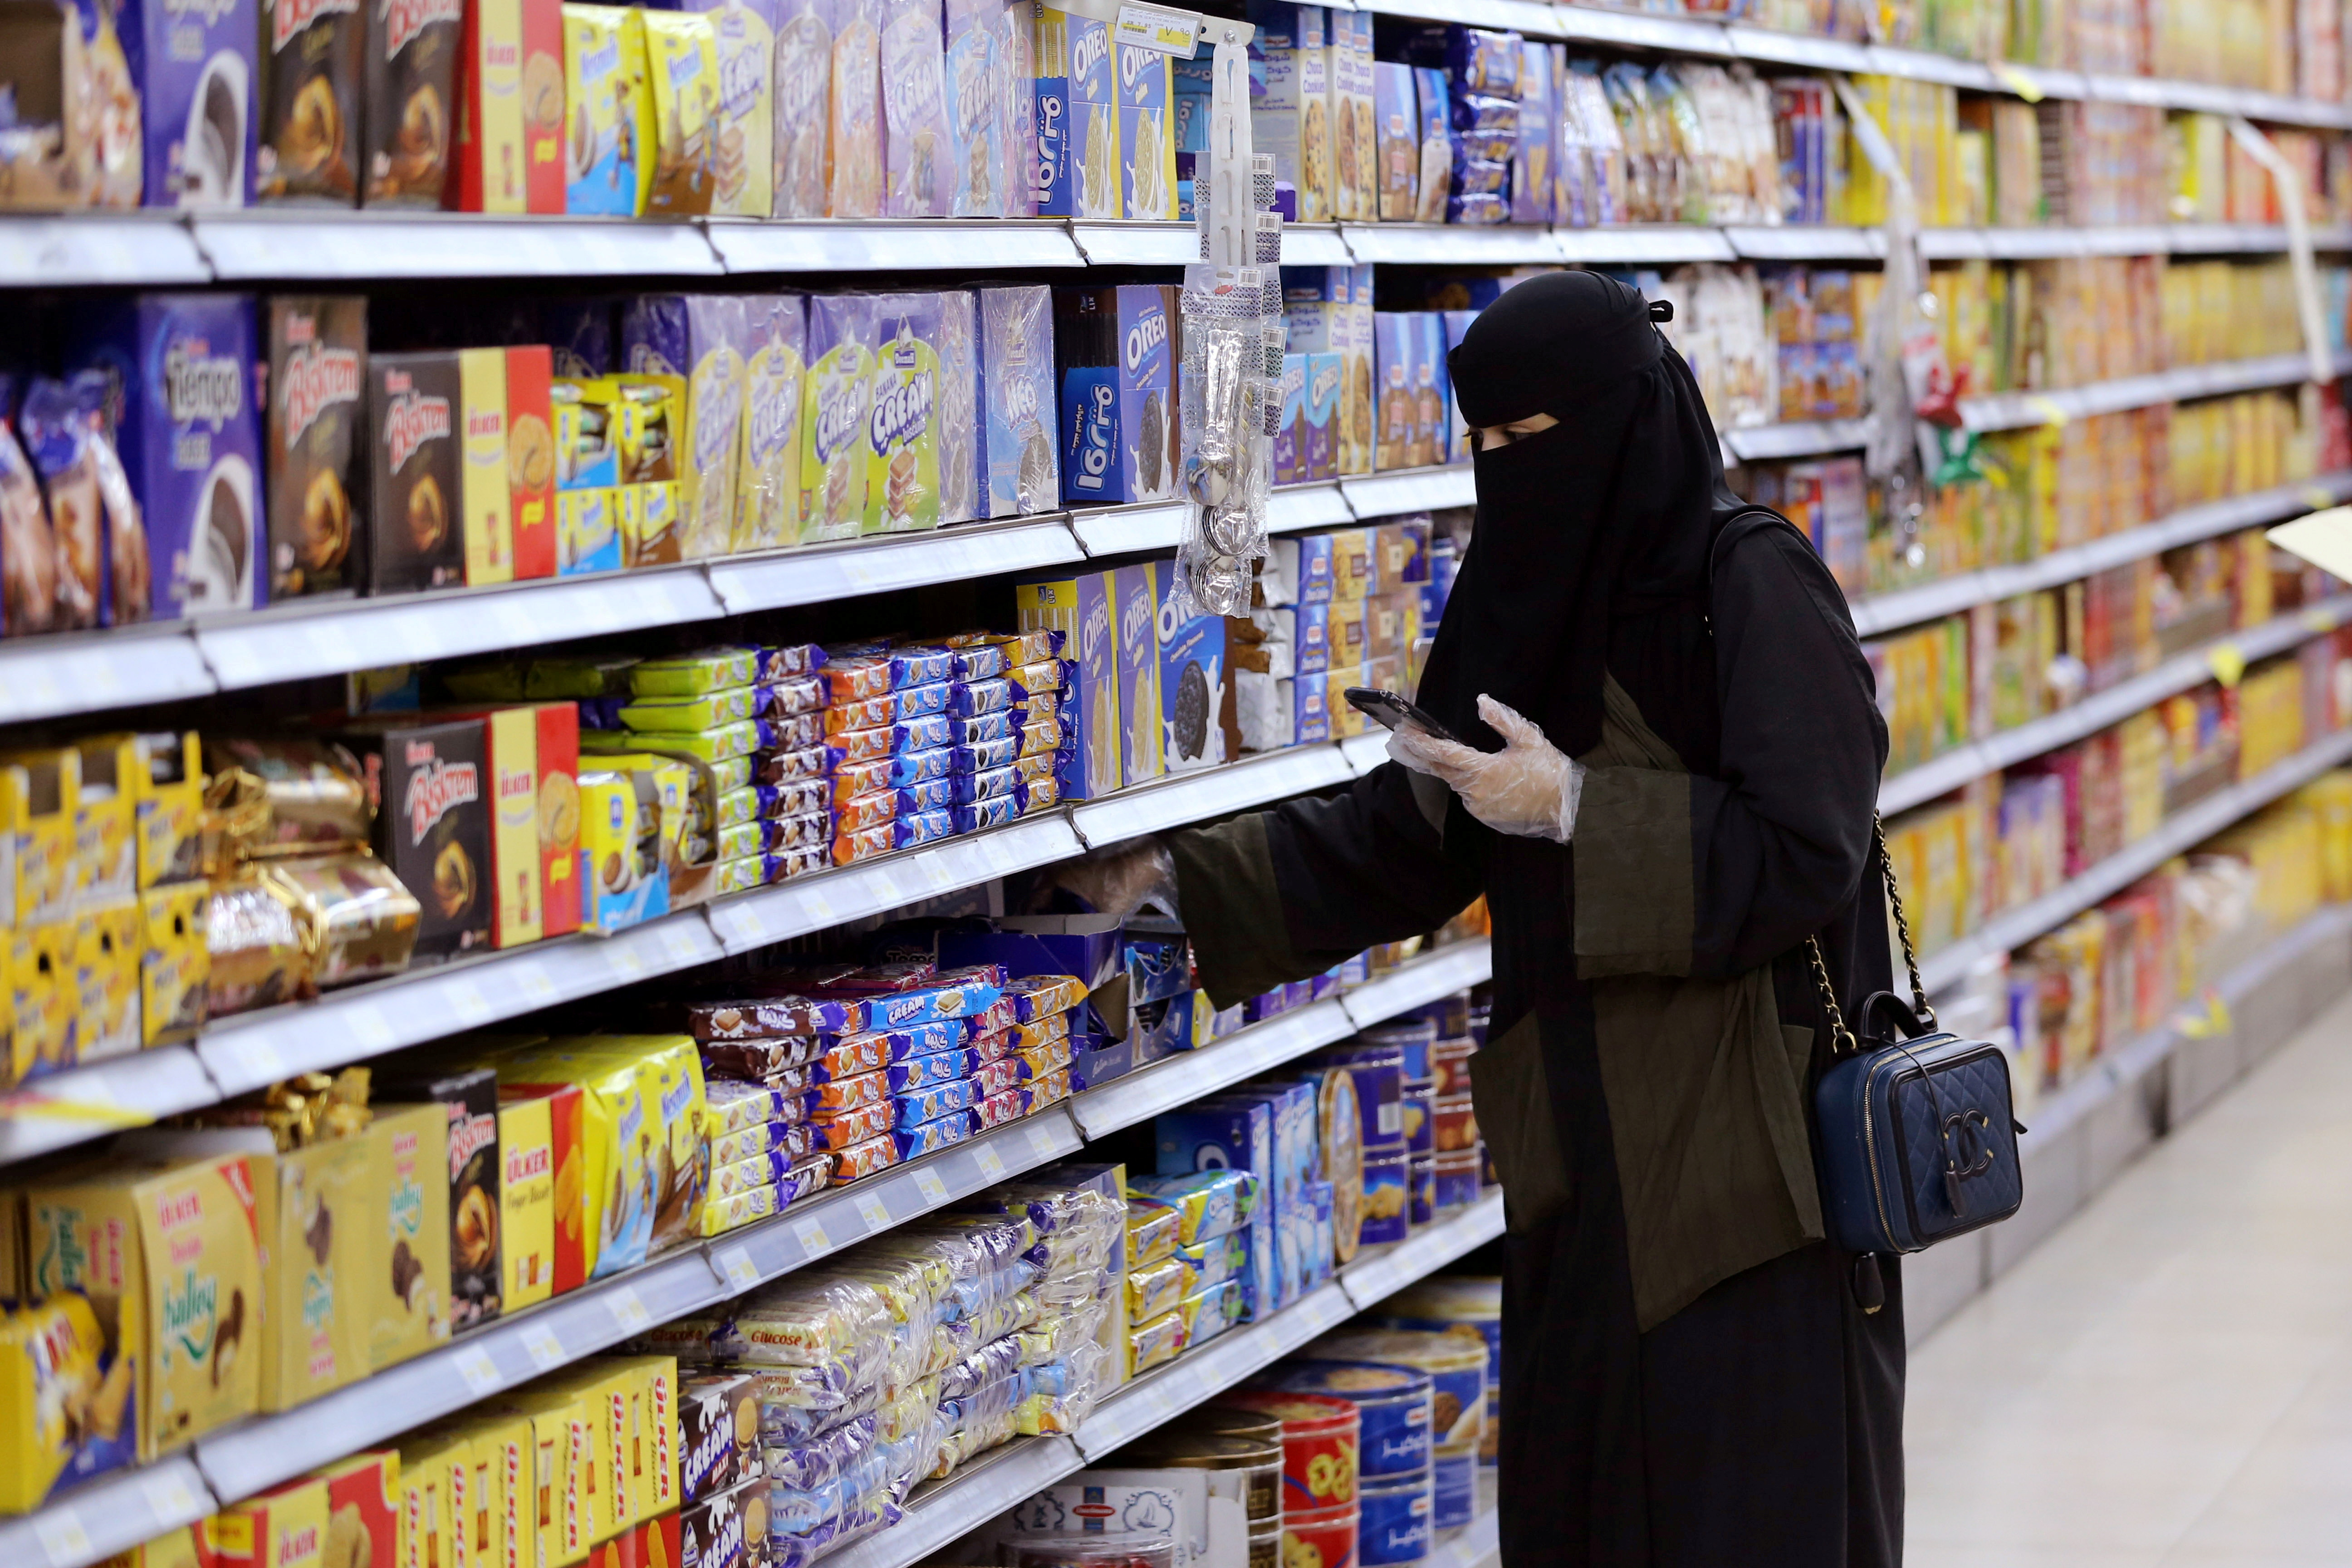 A Saudi woman wearing protective gloves shops at a supermarket, following the outbreak of the coronavirus disease (COVID-19), in Riyadh, Saudi Arabia May 11, 2020. REUTERS/Ahmed Yosri/